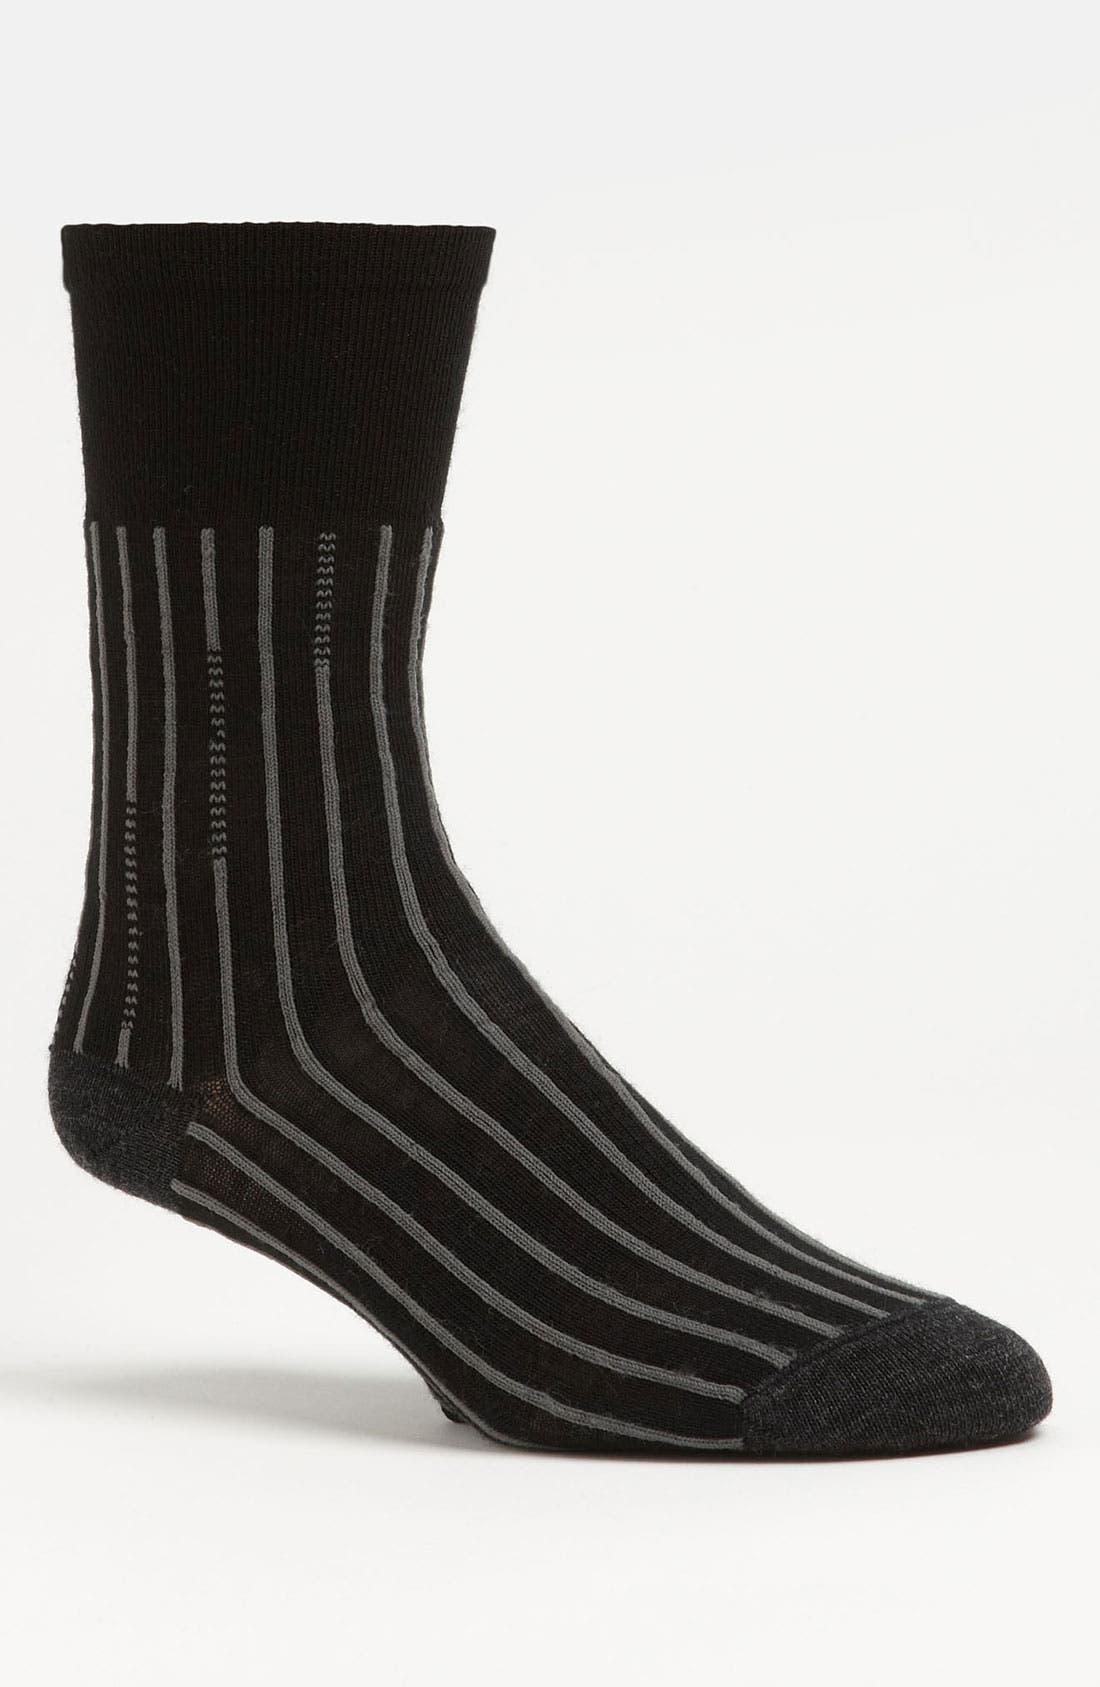 Alternate Image 1 Selected - Smartwool Broken Pinstripe Socks